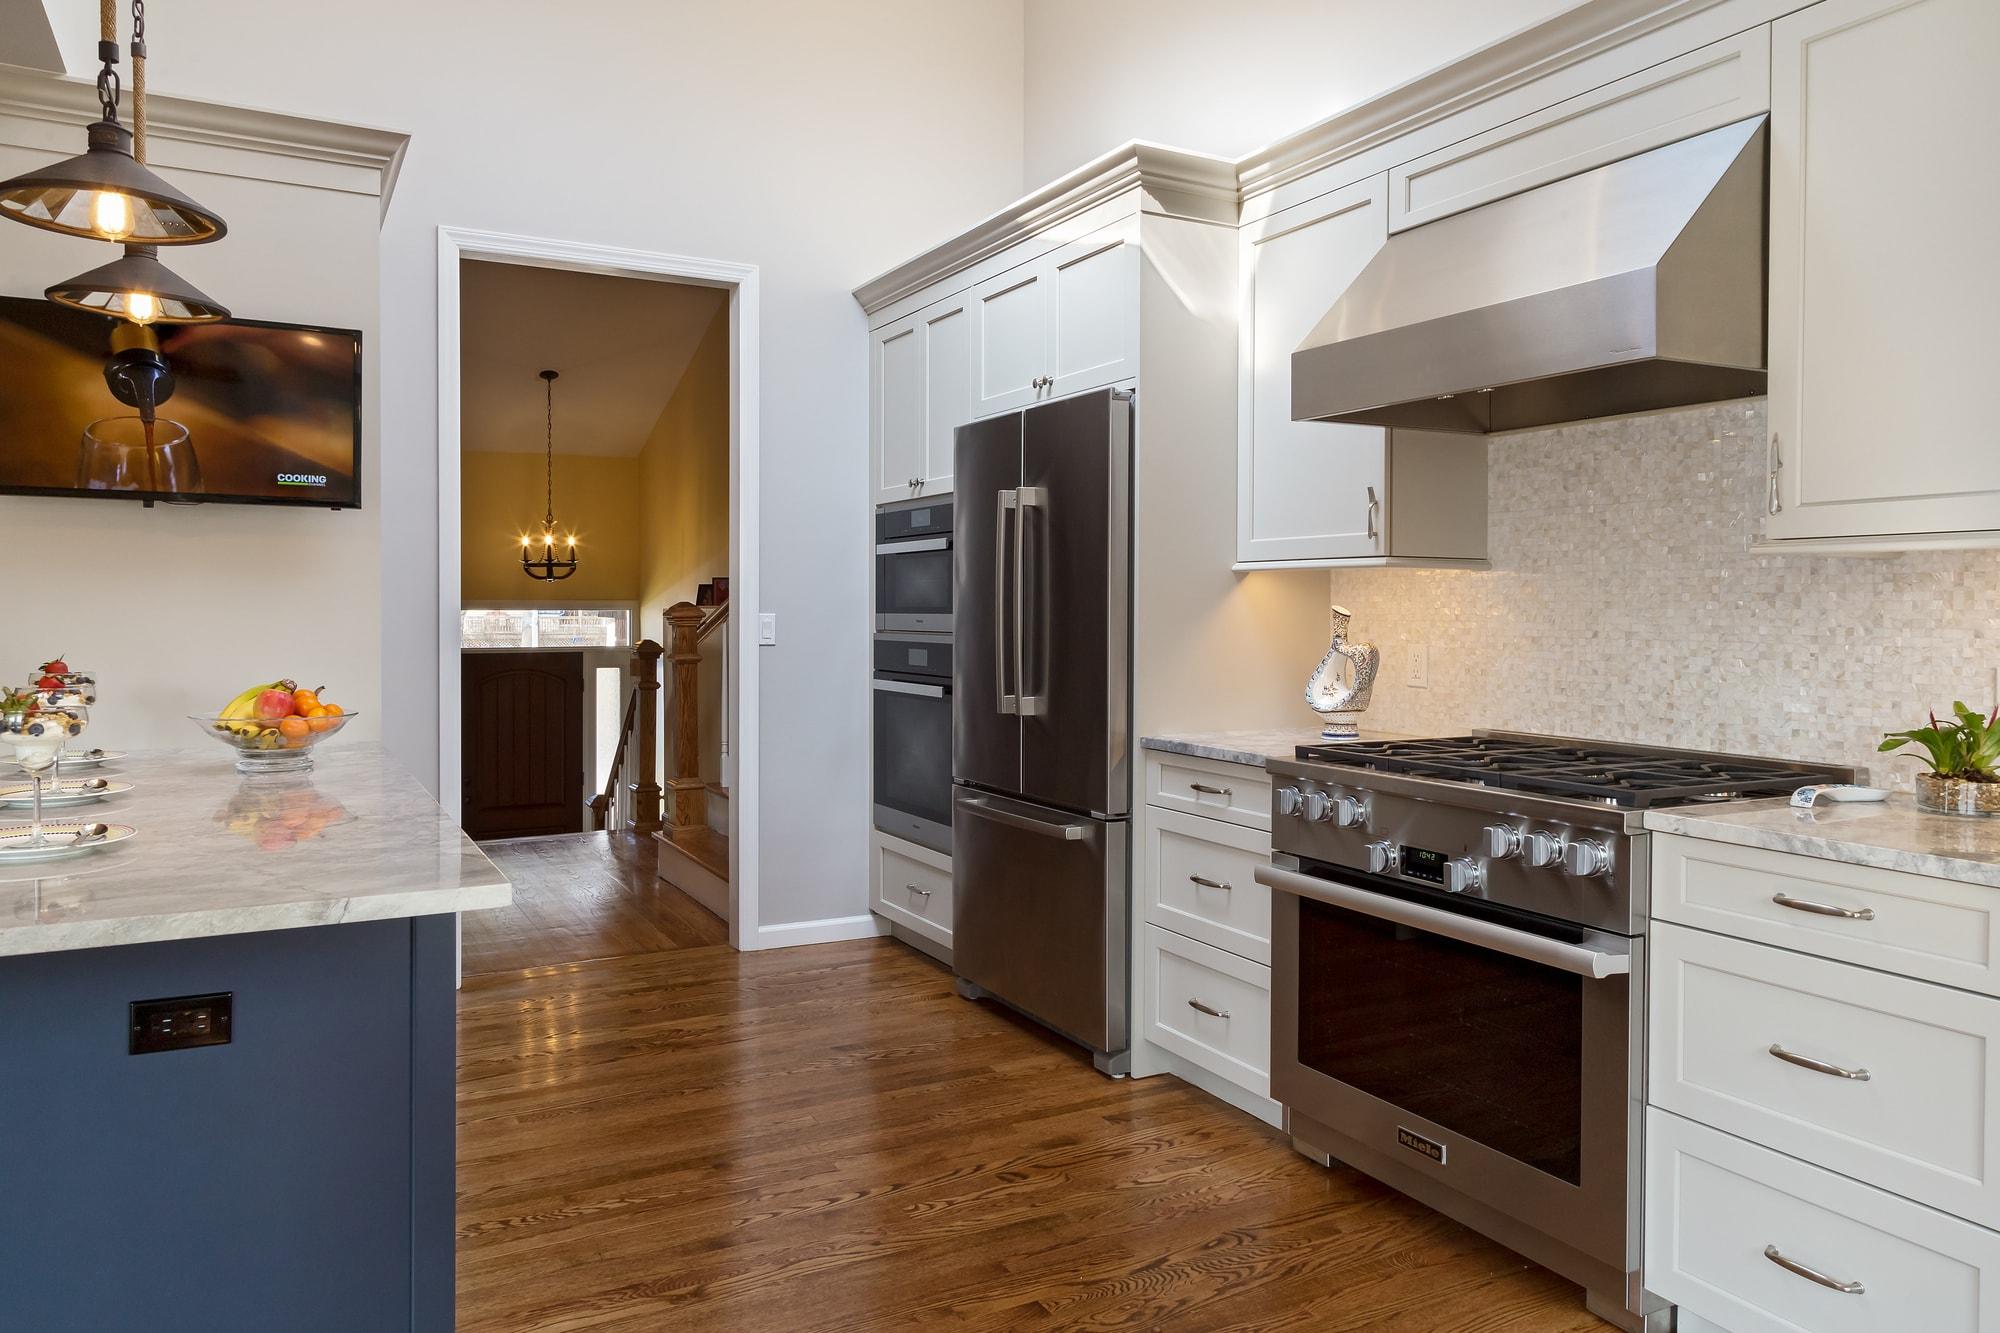 Transitional style kitchen with hardwood floors